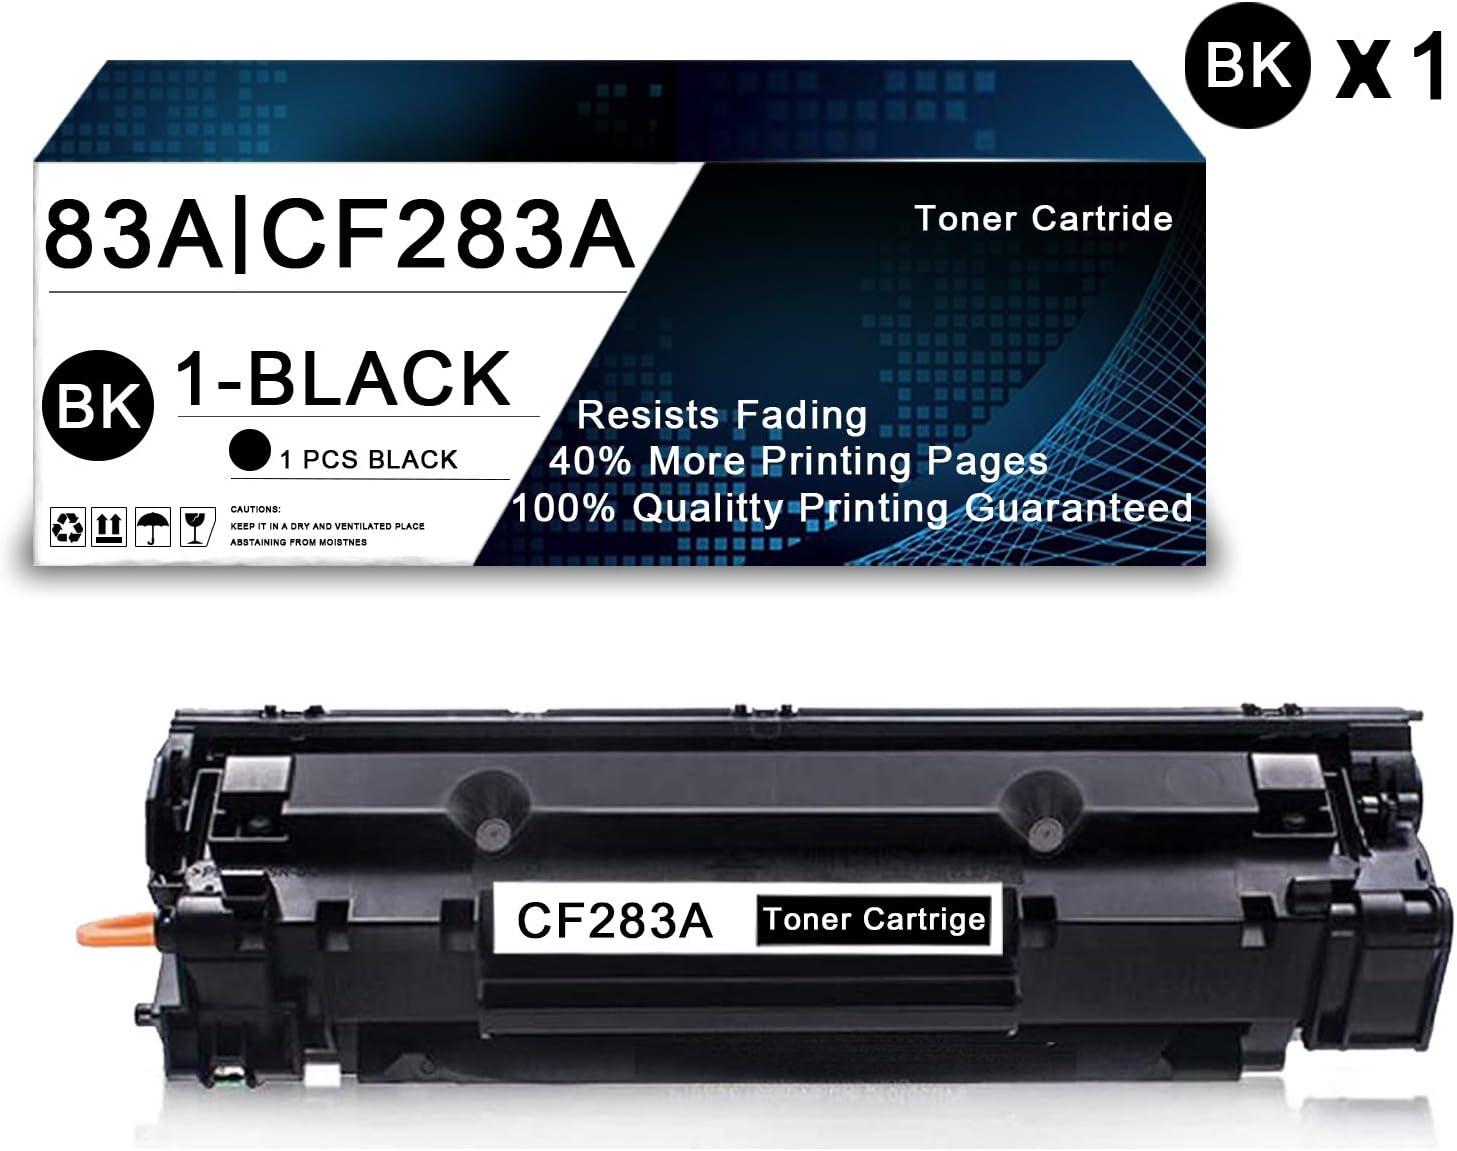 1 Pack Black 83A | CF283A Compatible Toner Cartridge Replacement for HP Laserjet Pro M201n M201dw MFP M225dn MFP M126nw MFP M125r MFP M127fn MFP M128fw Printers Toner Cartridge.